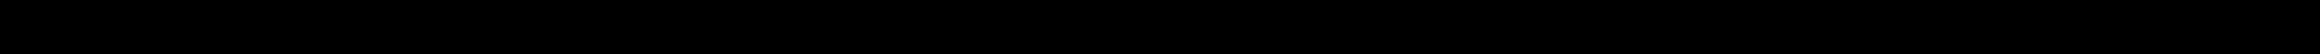 TRUCKTEC AUTOMOTIVE 05.362.70.020, 09.801.02.570, 09.801.06.200, 09.801.06.360, 1439324 Σετ τακάκια, δισκόφρενα